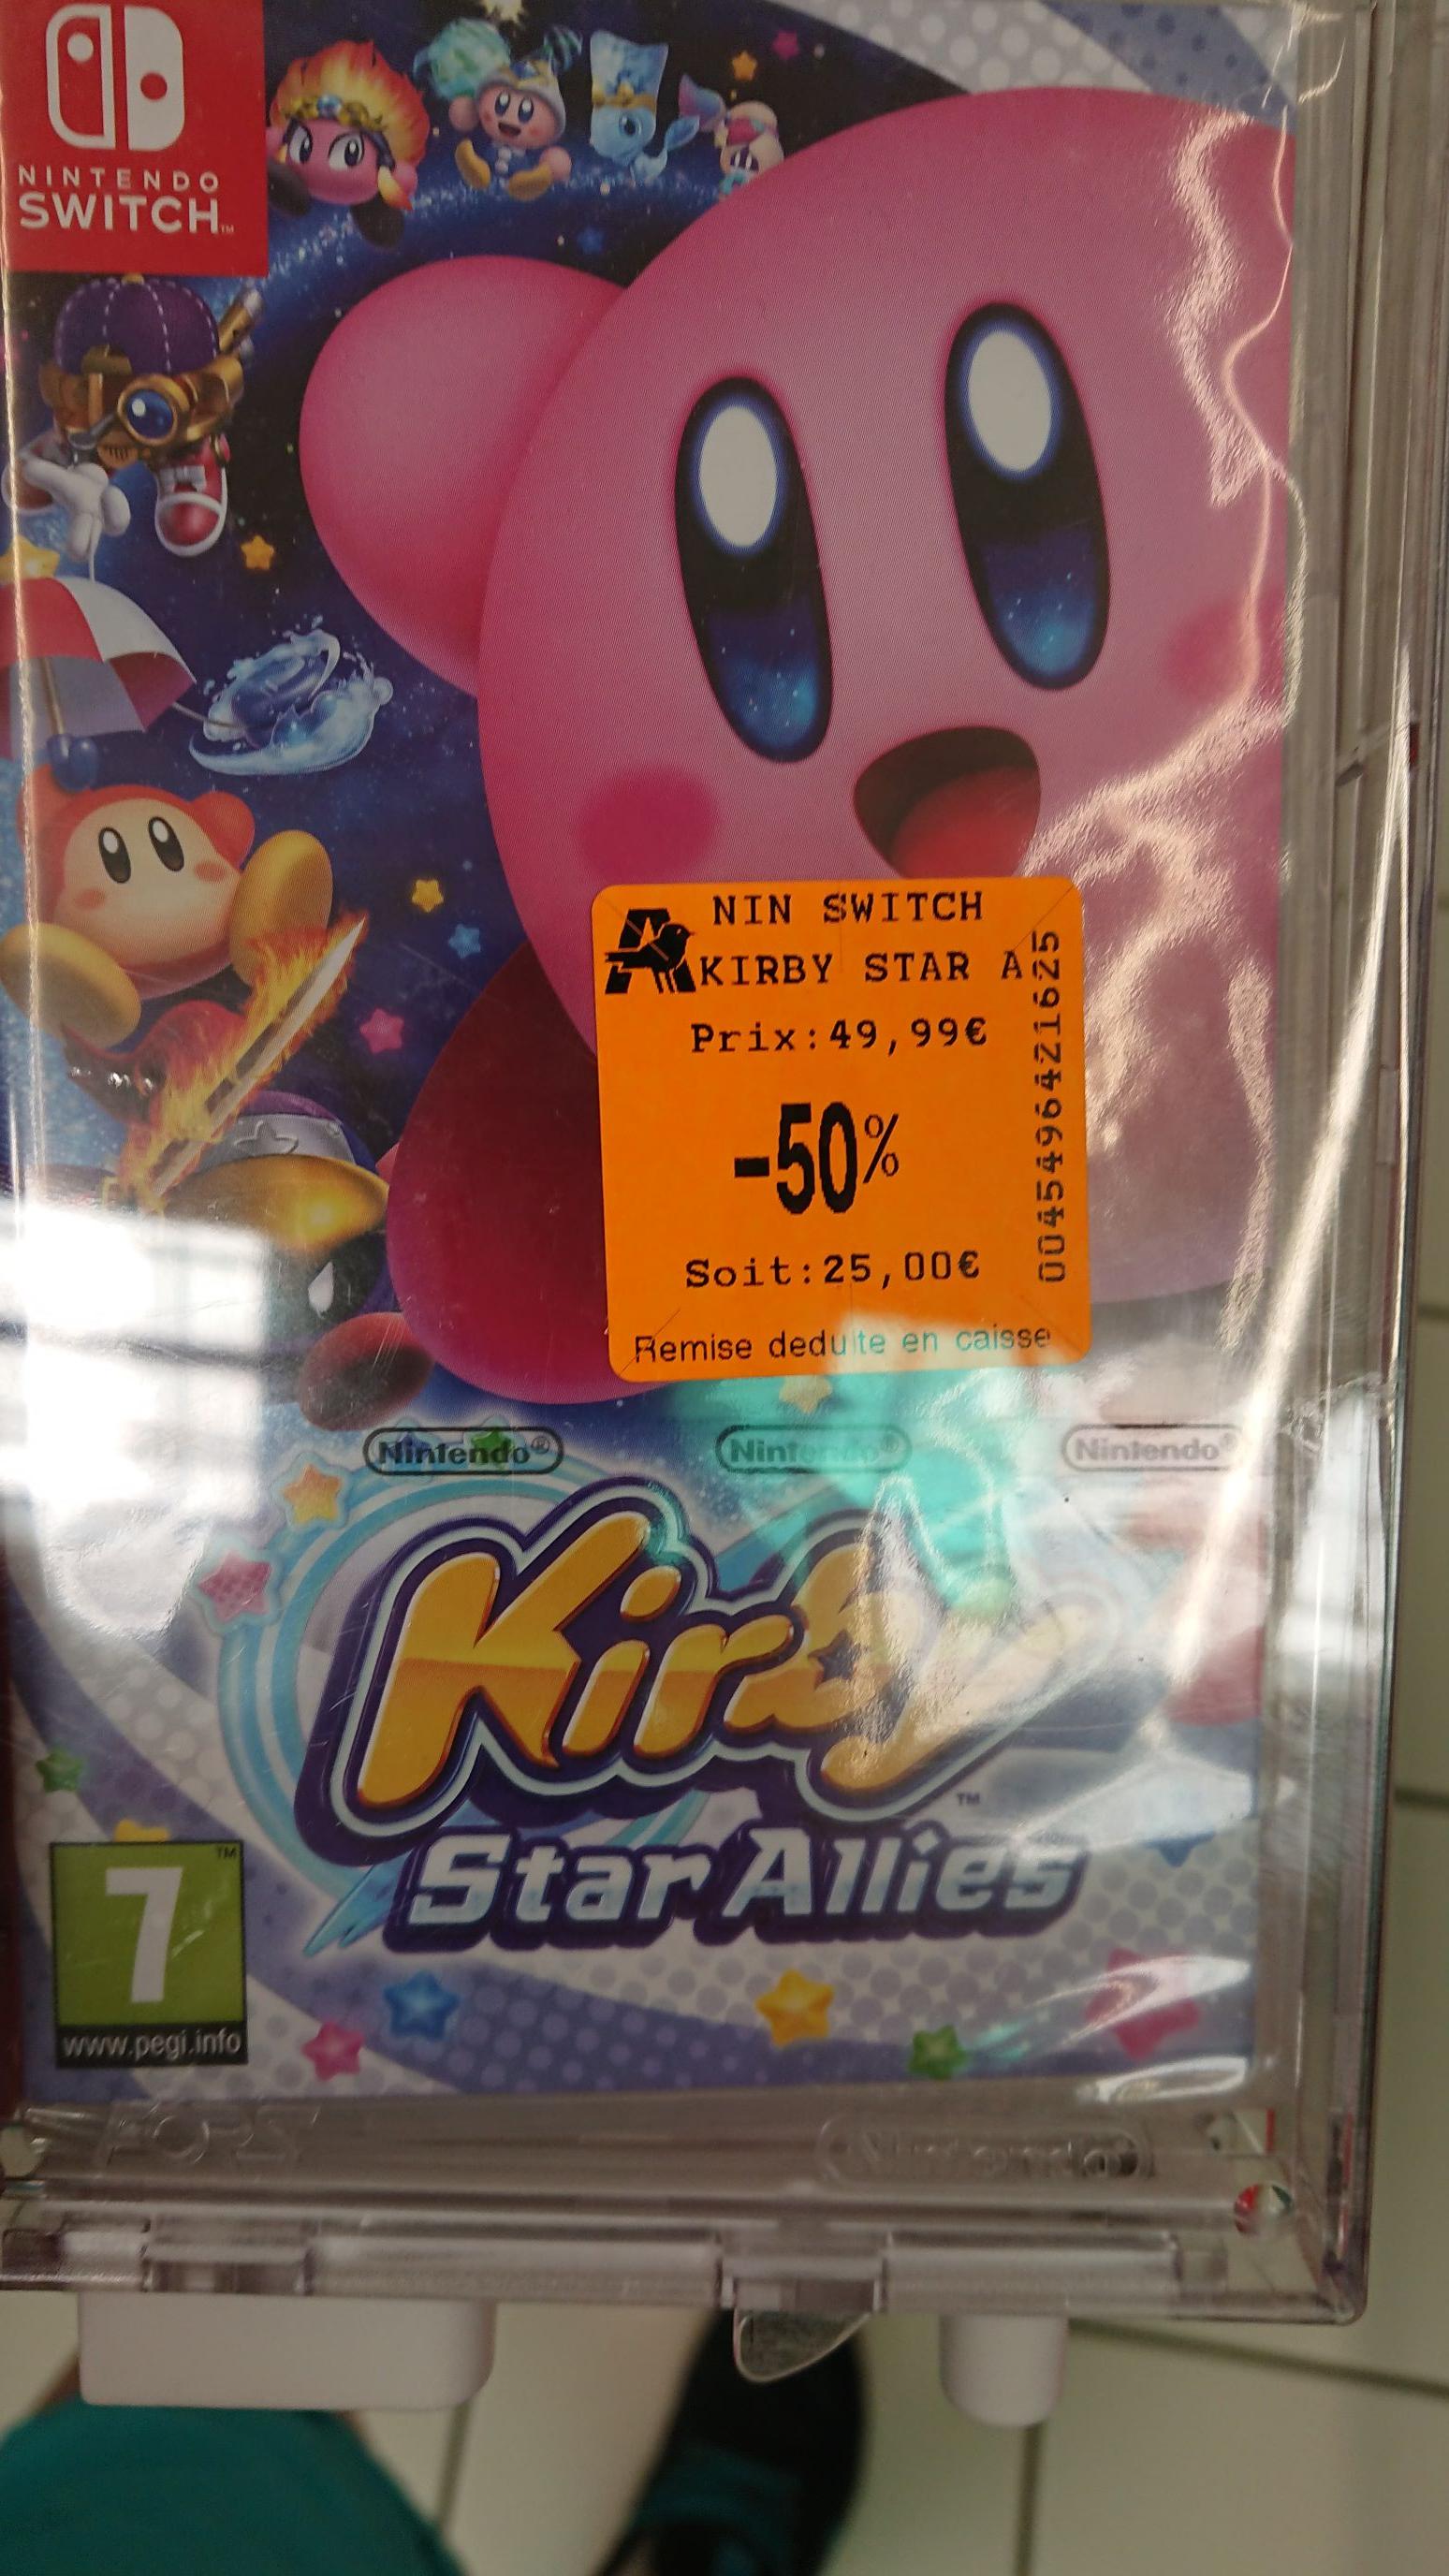 Jeu Kirby Star Allies sur Nintendo Switch - Poitiers (86)